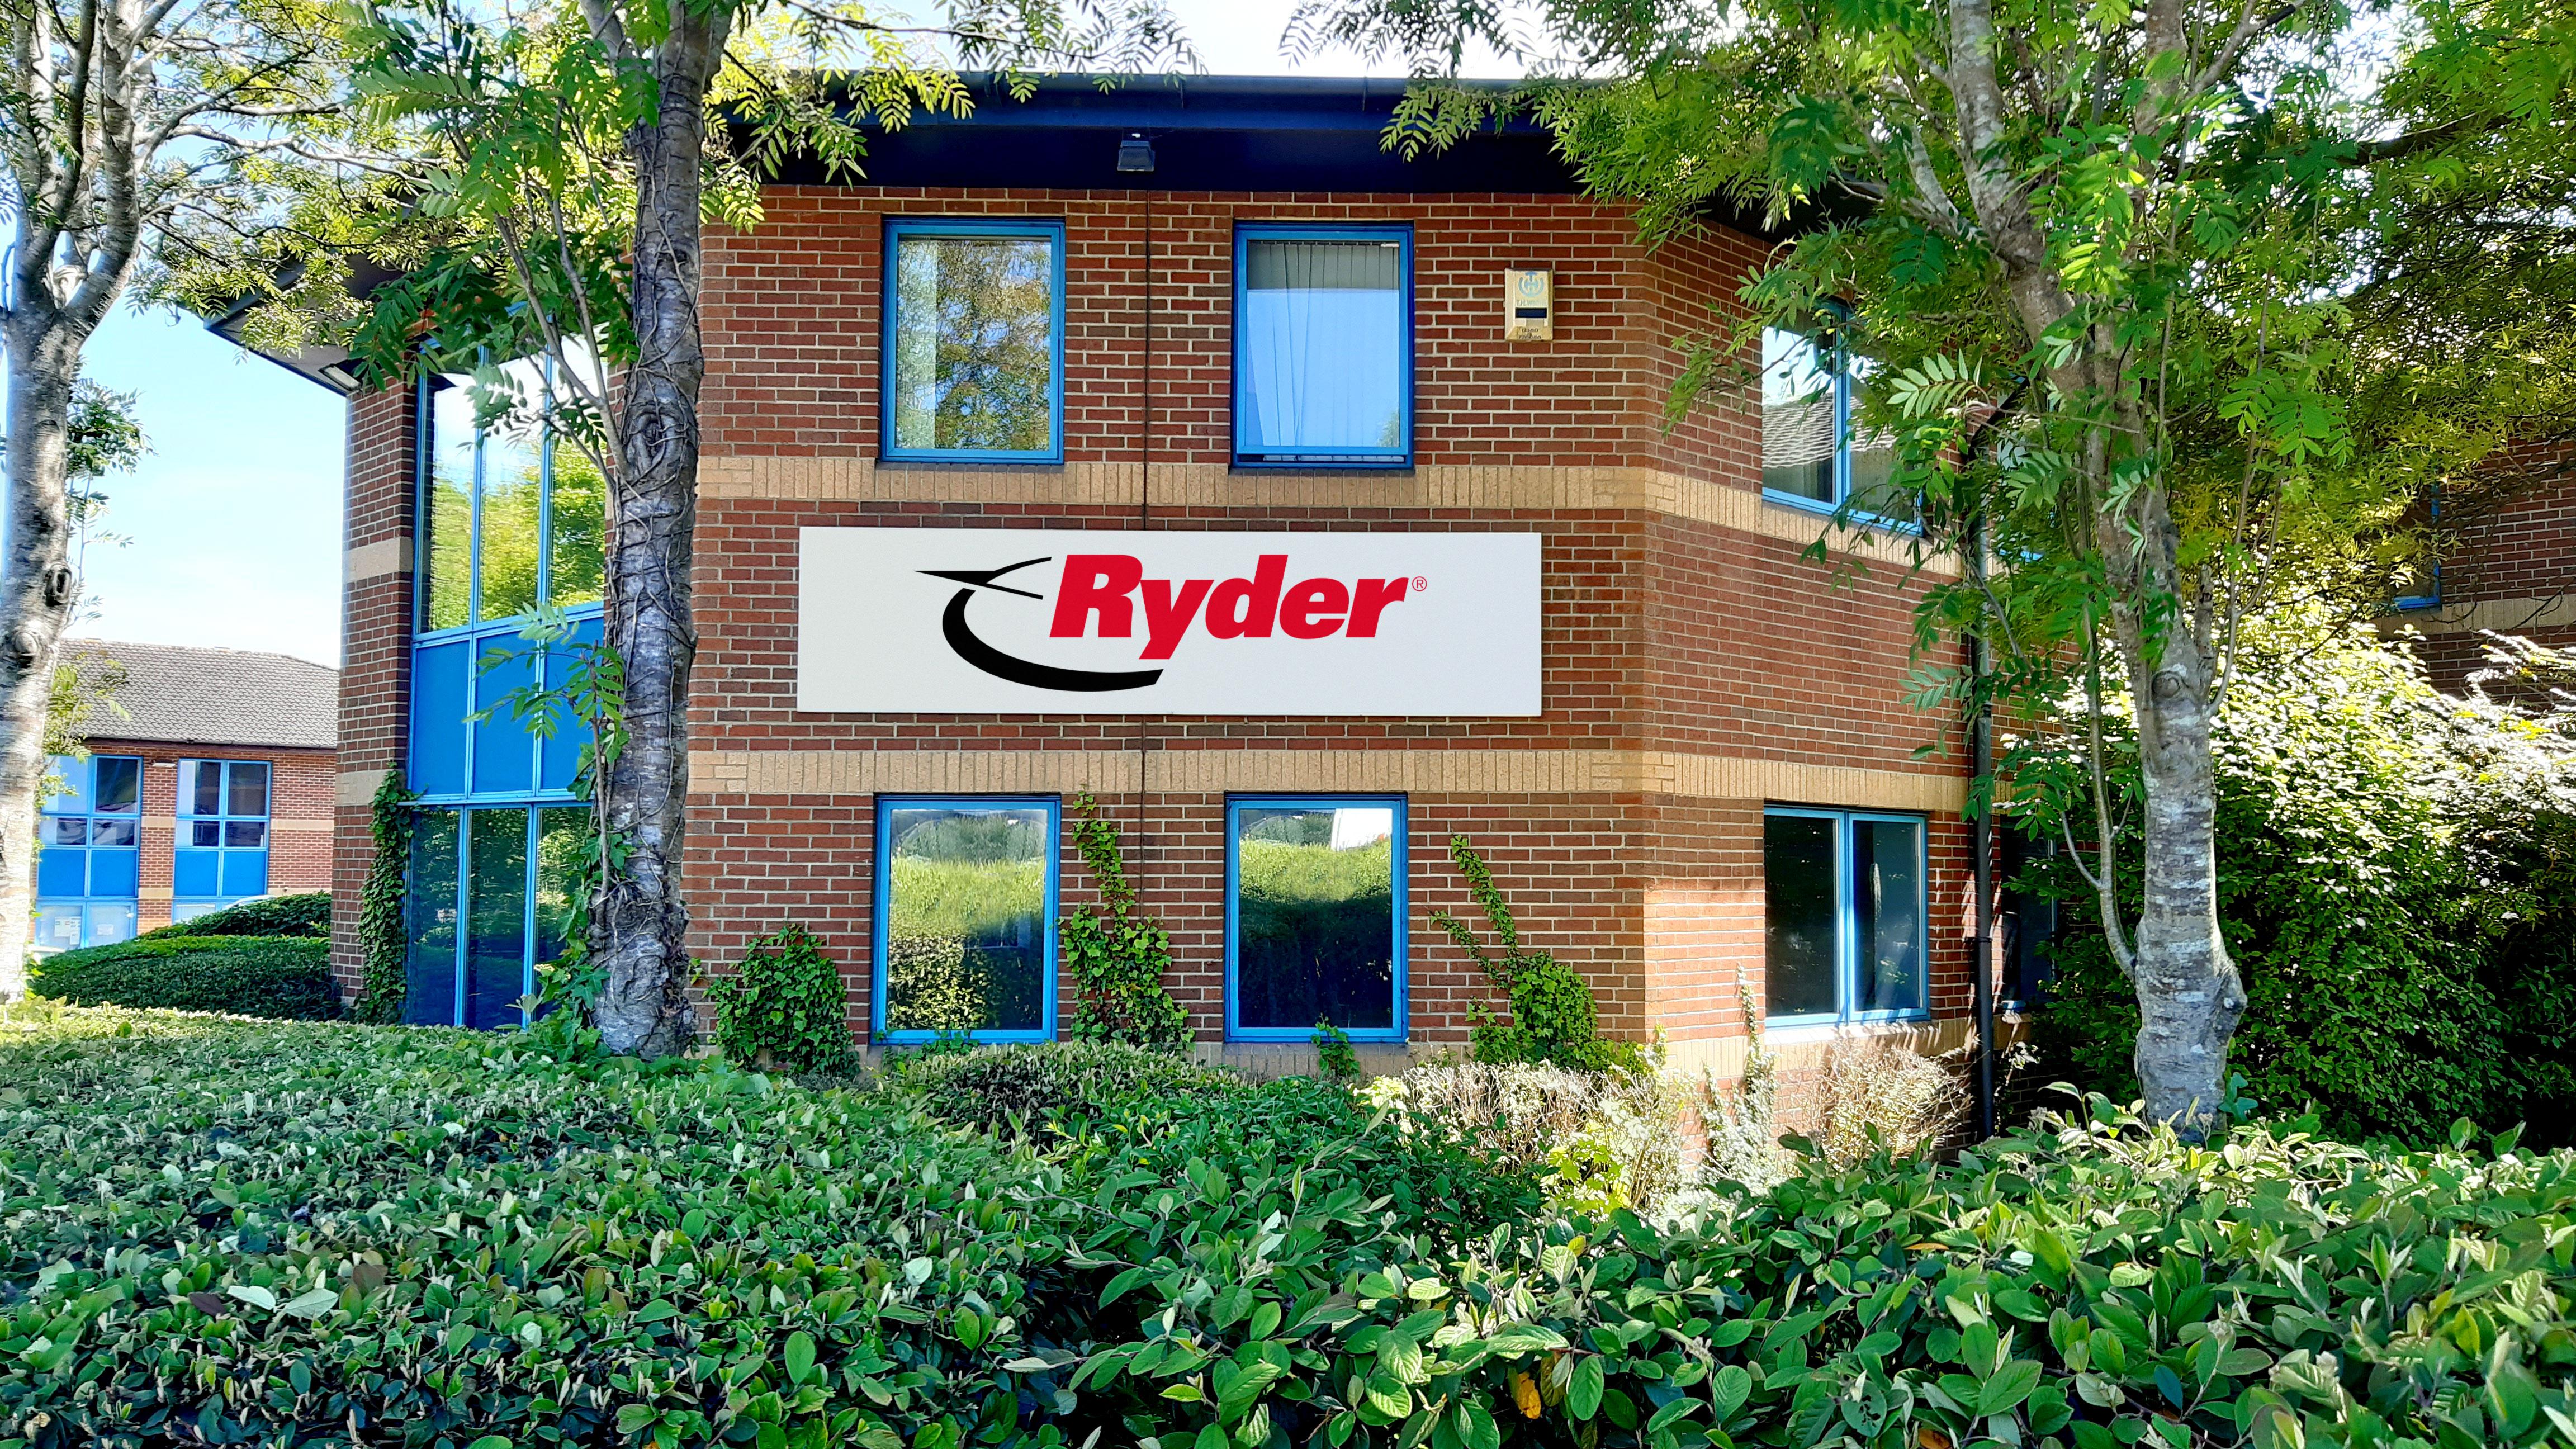 Ryder Devizes Headquarters